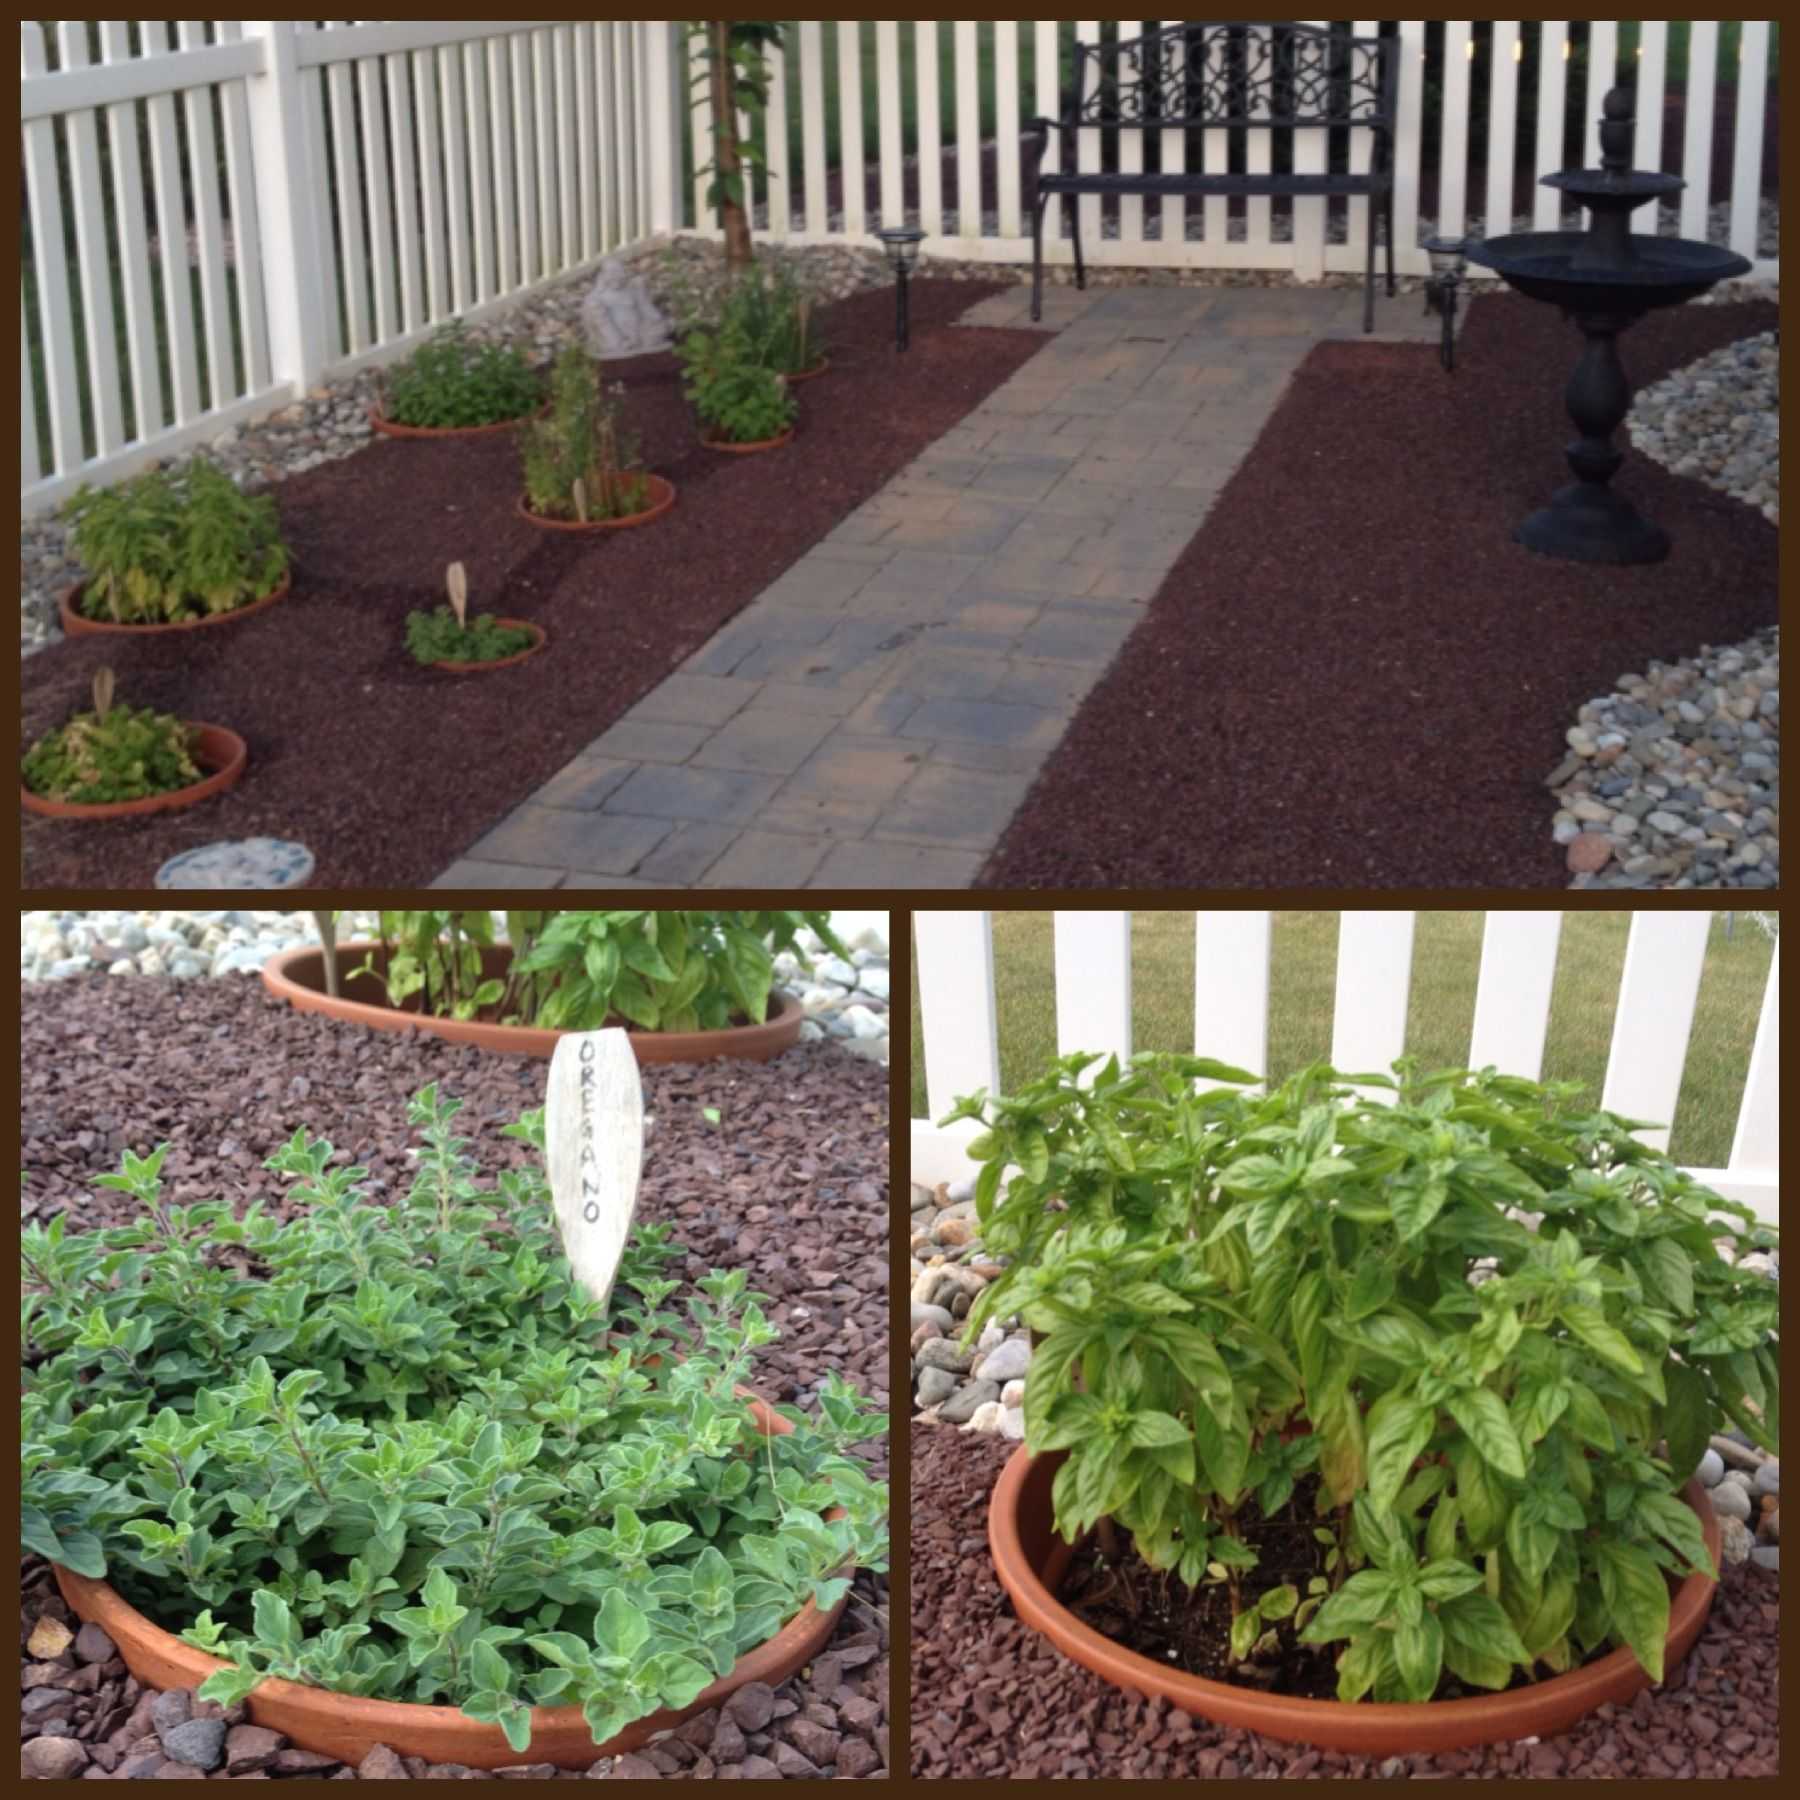 Sunken pot herb garden